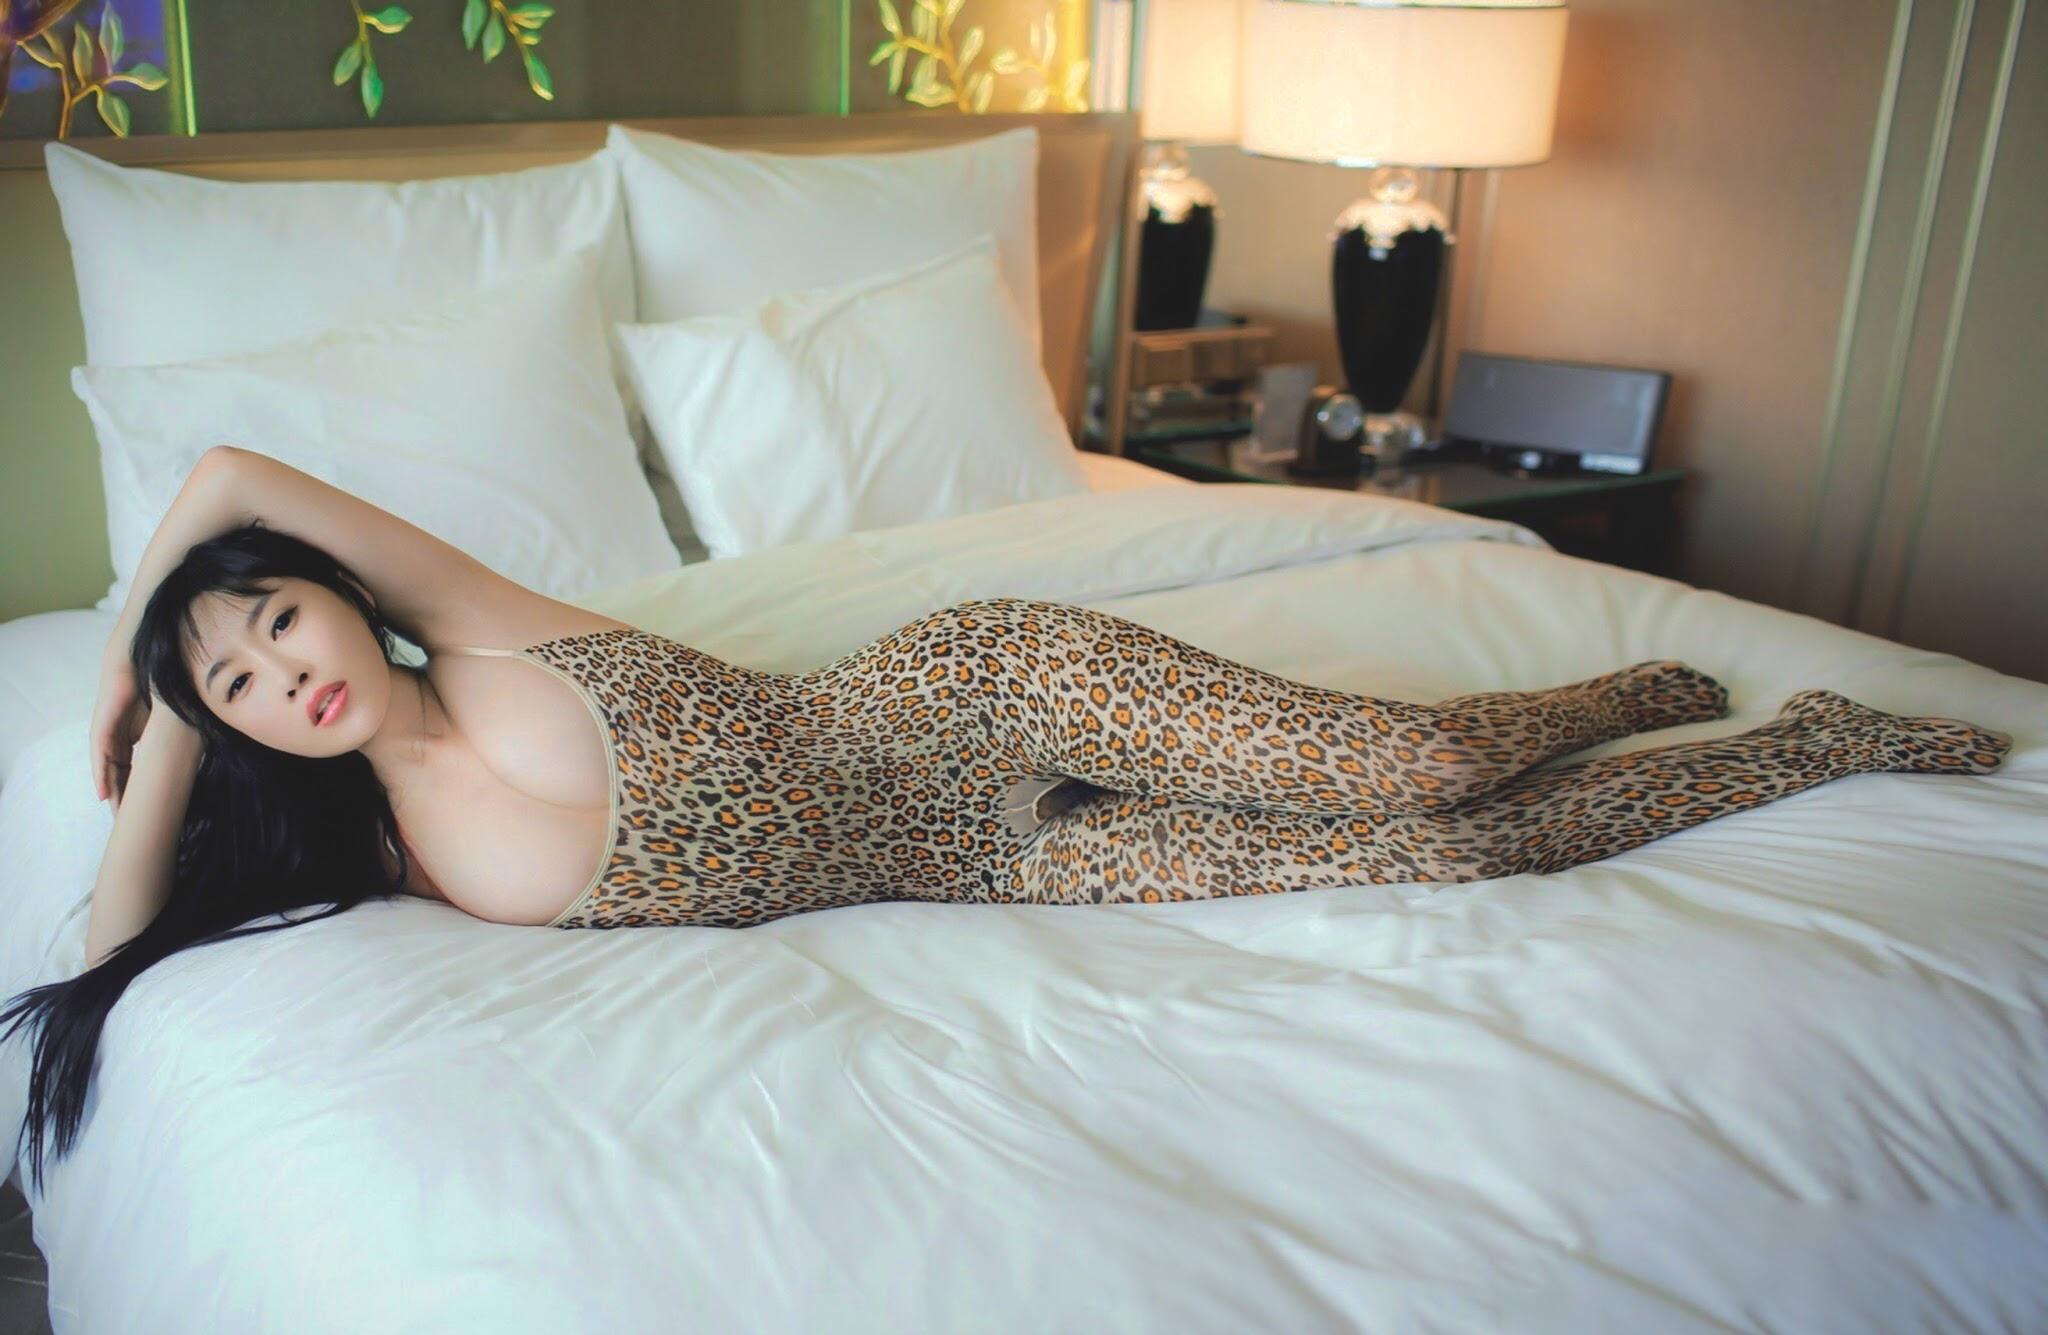 Rita-Nude-Tuigirl-Photos PhmVu Blog Tuigirl Rita